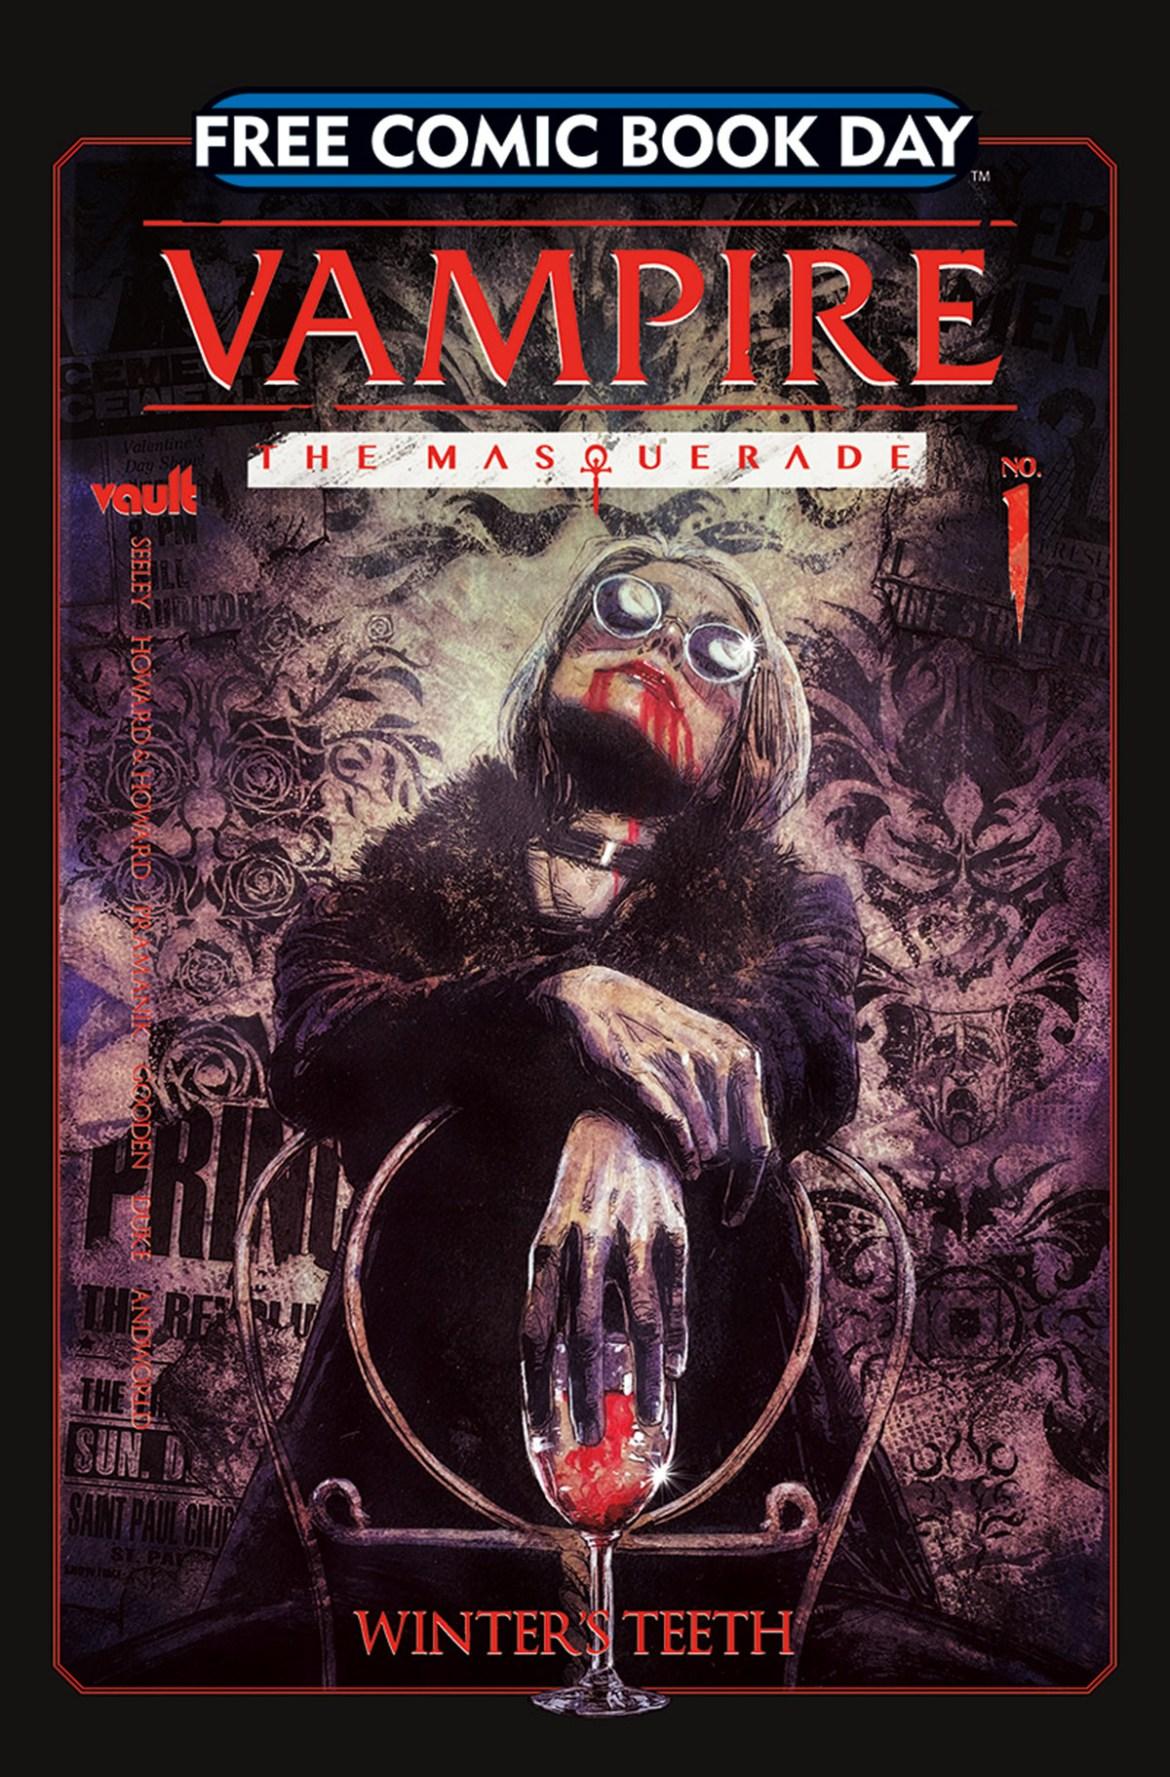 FCBD21_SILVER_Vault_Vampire-Masquerade Complete Free Comic Book Day 2021 comic book line-up announced